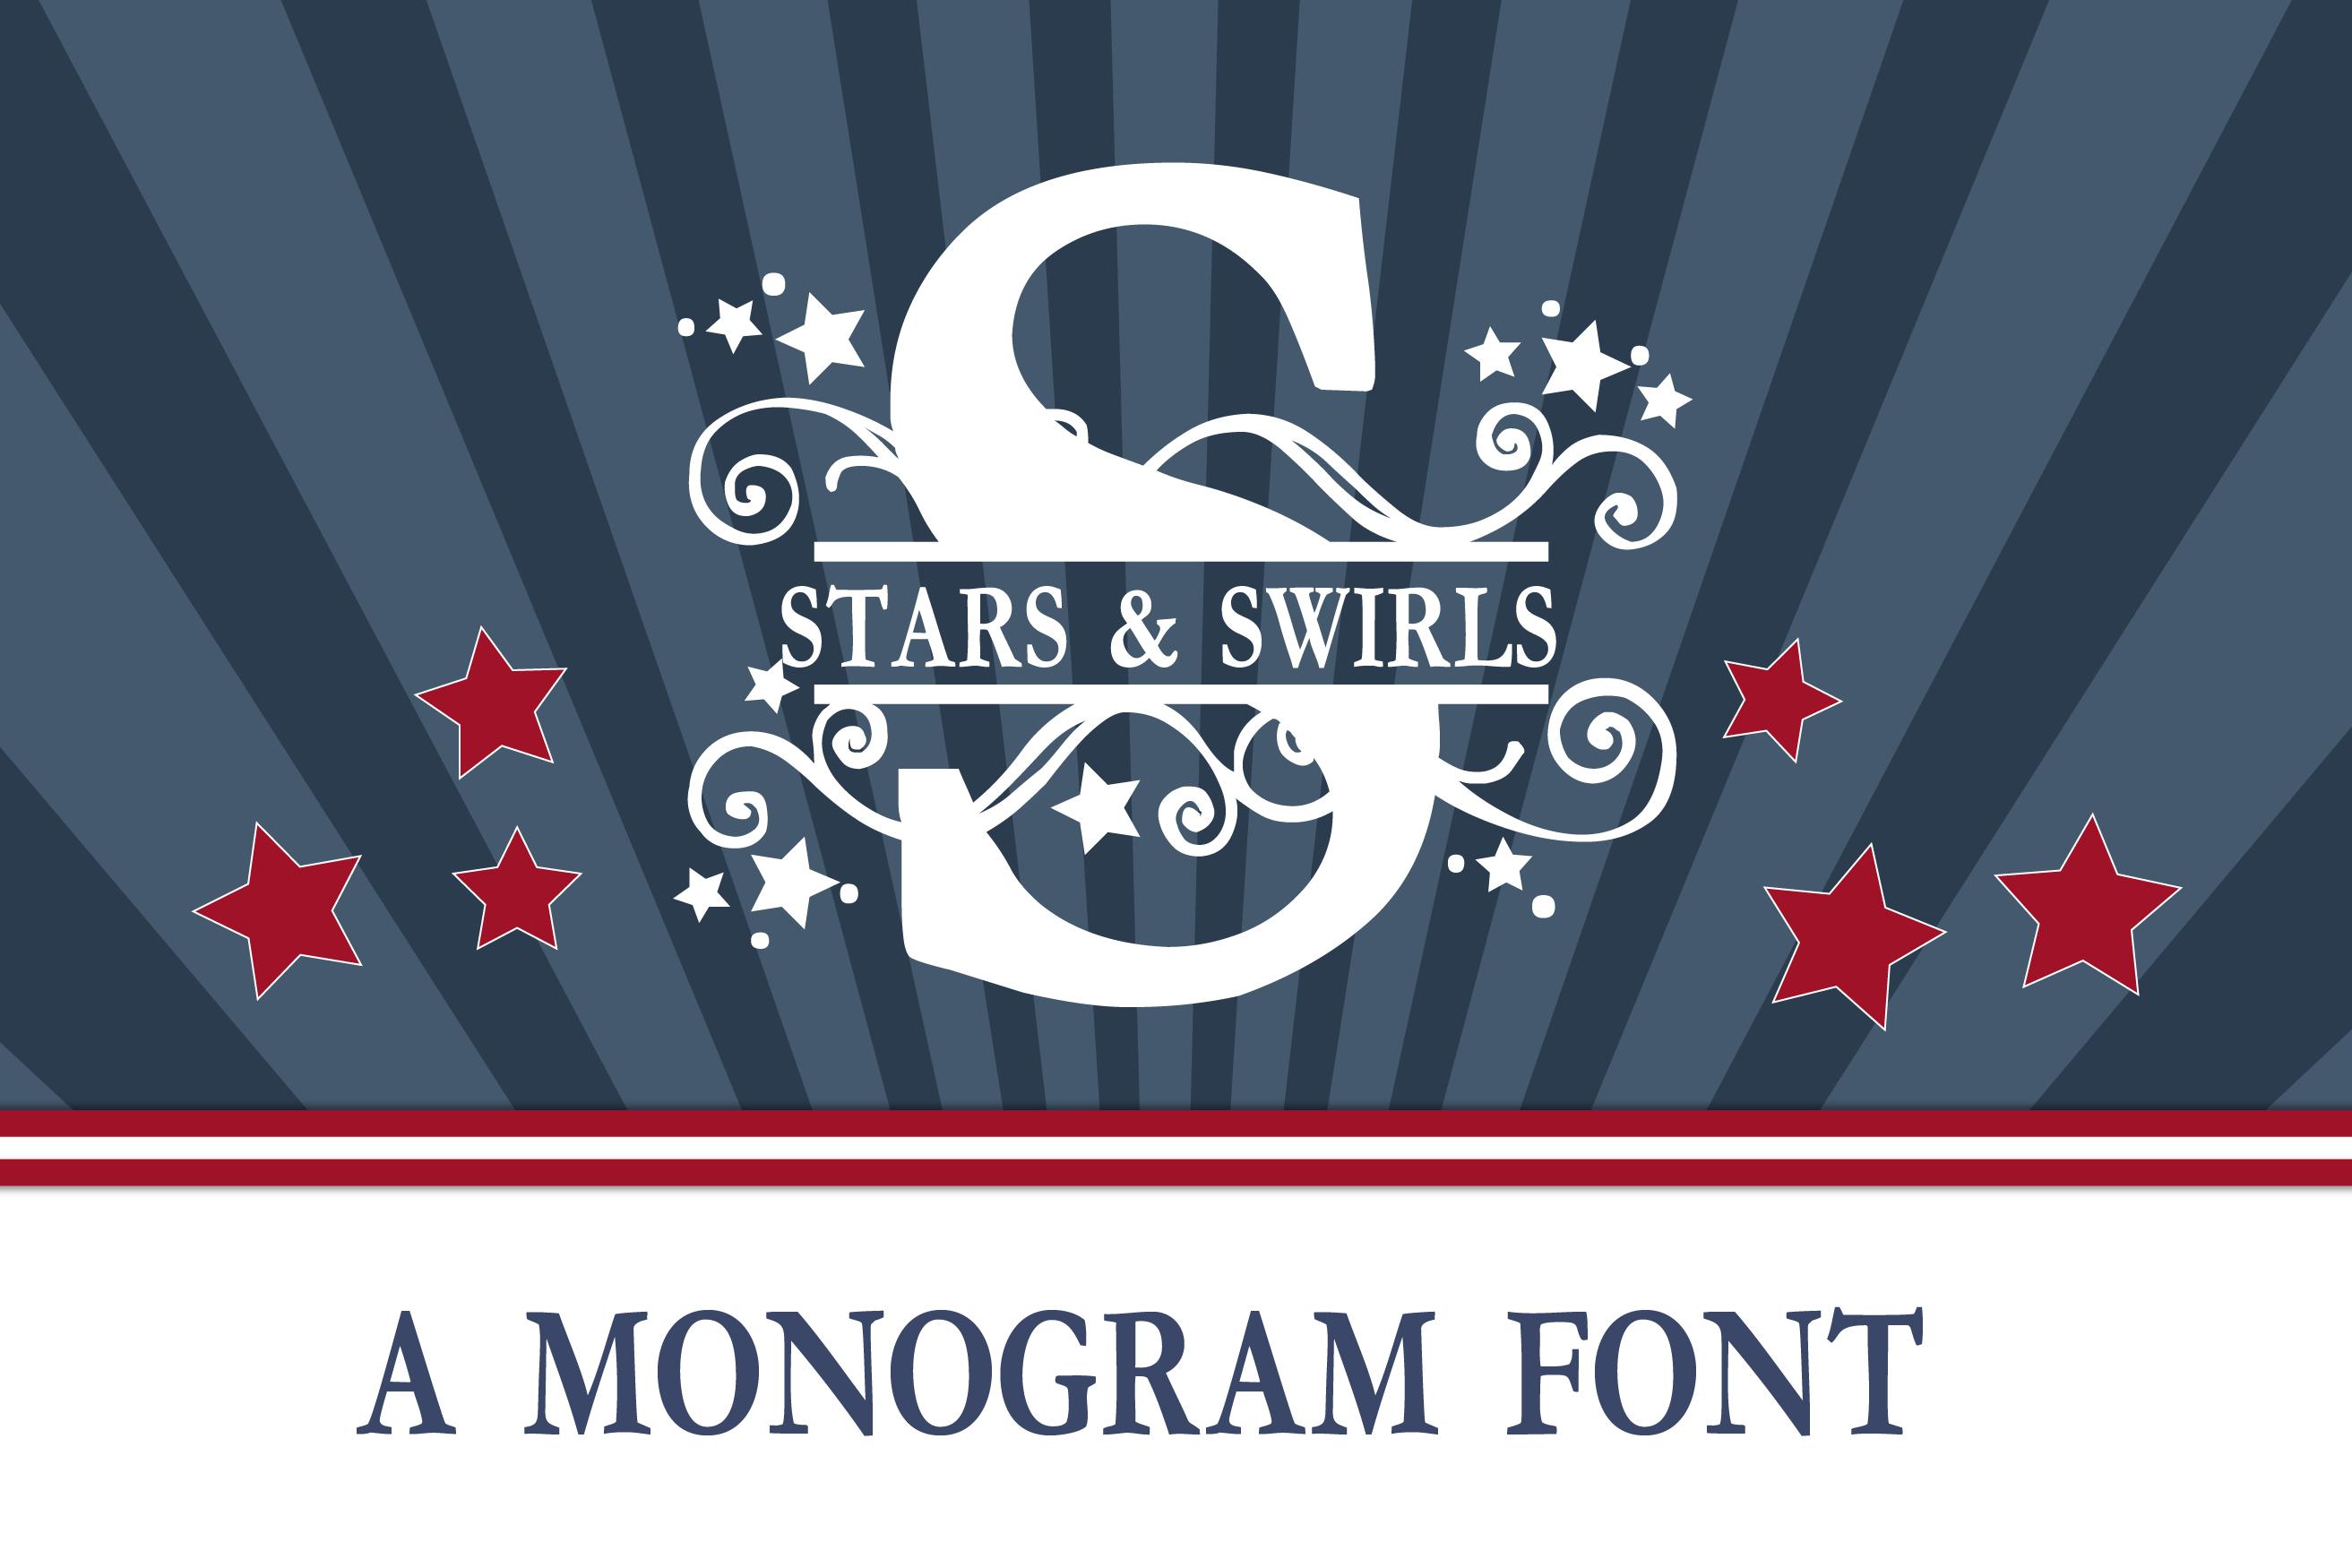 PN Stars & Swirls Monogram Banner Font example image 1